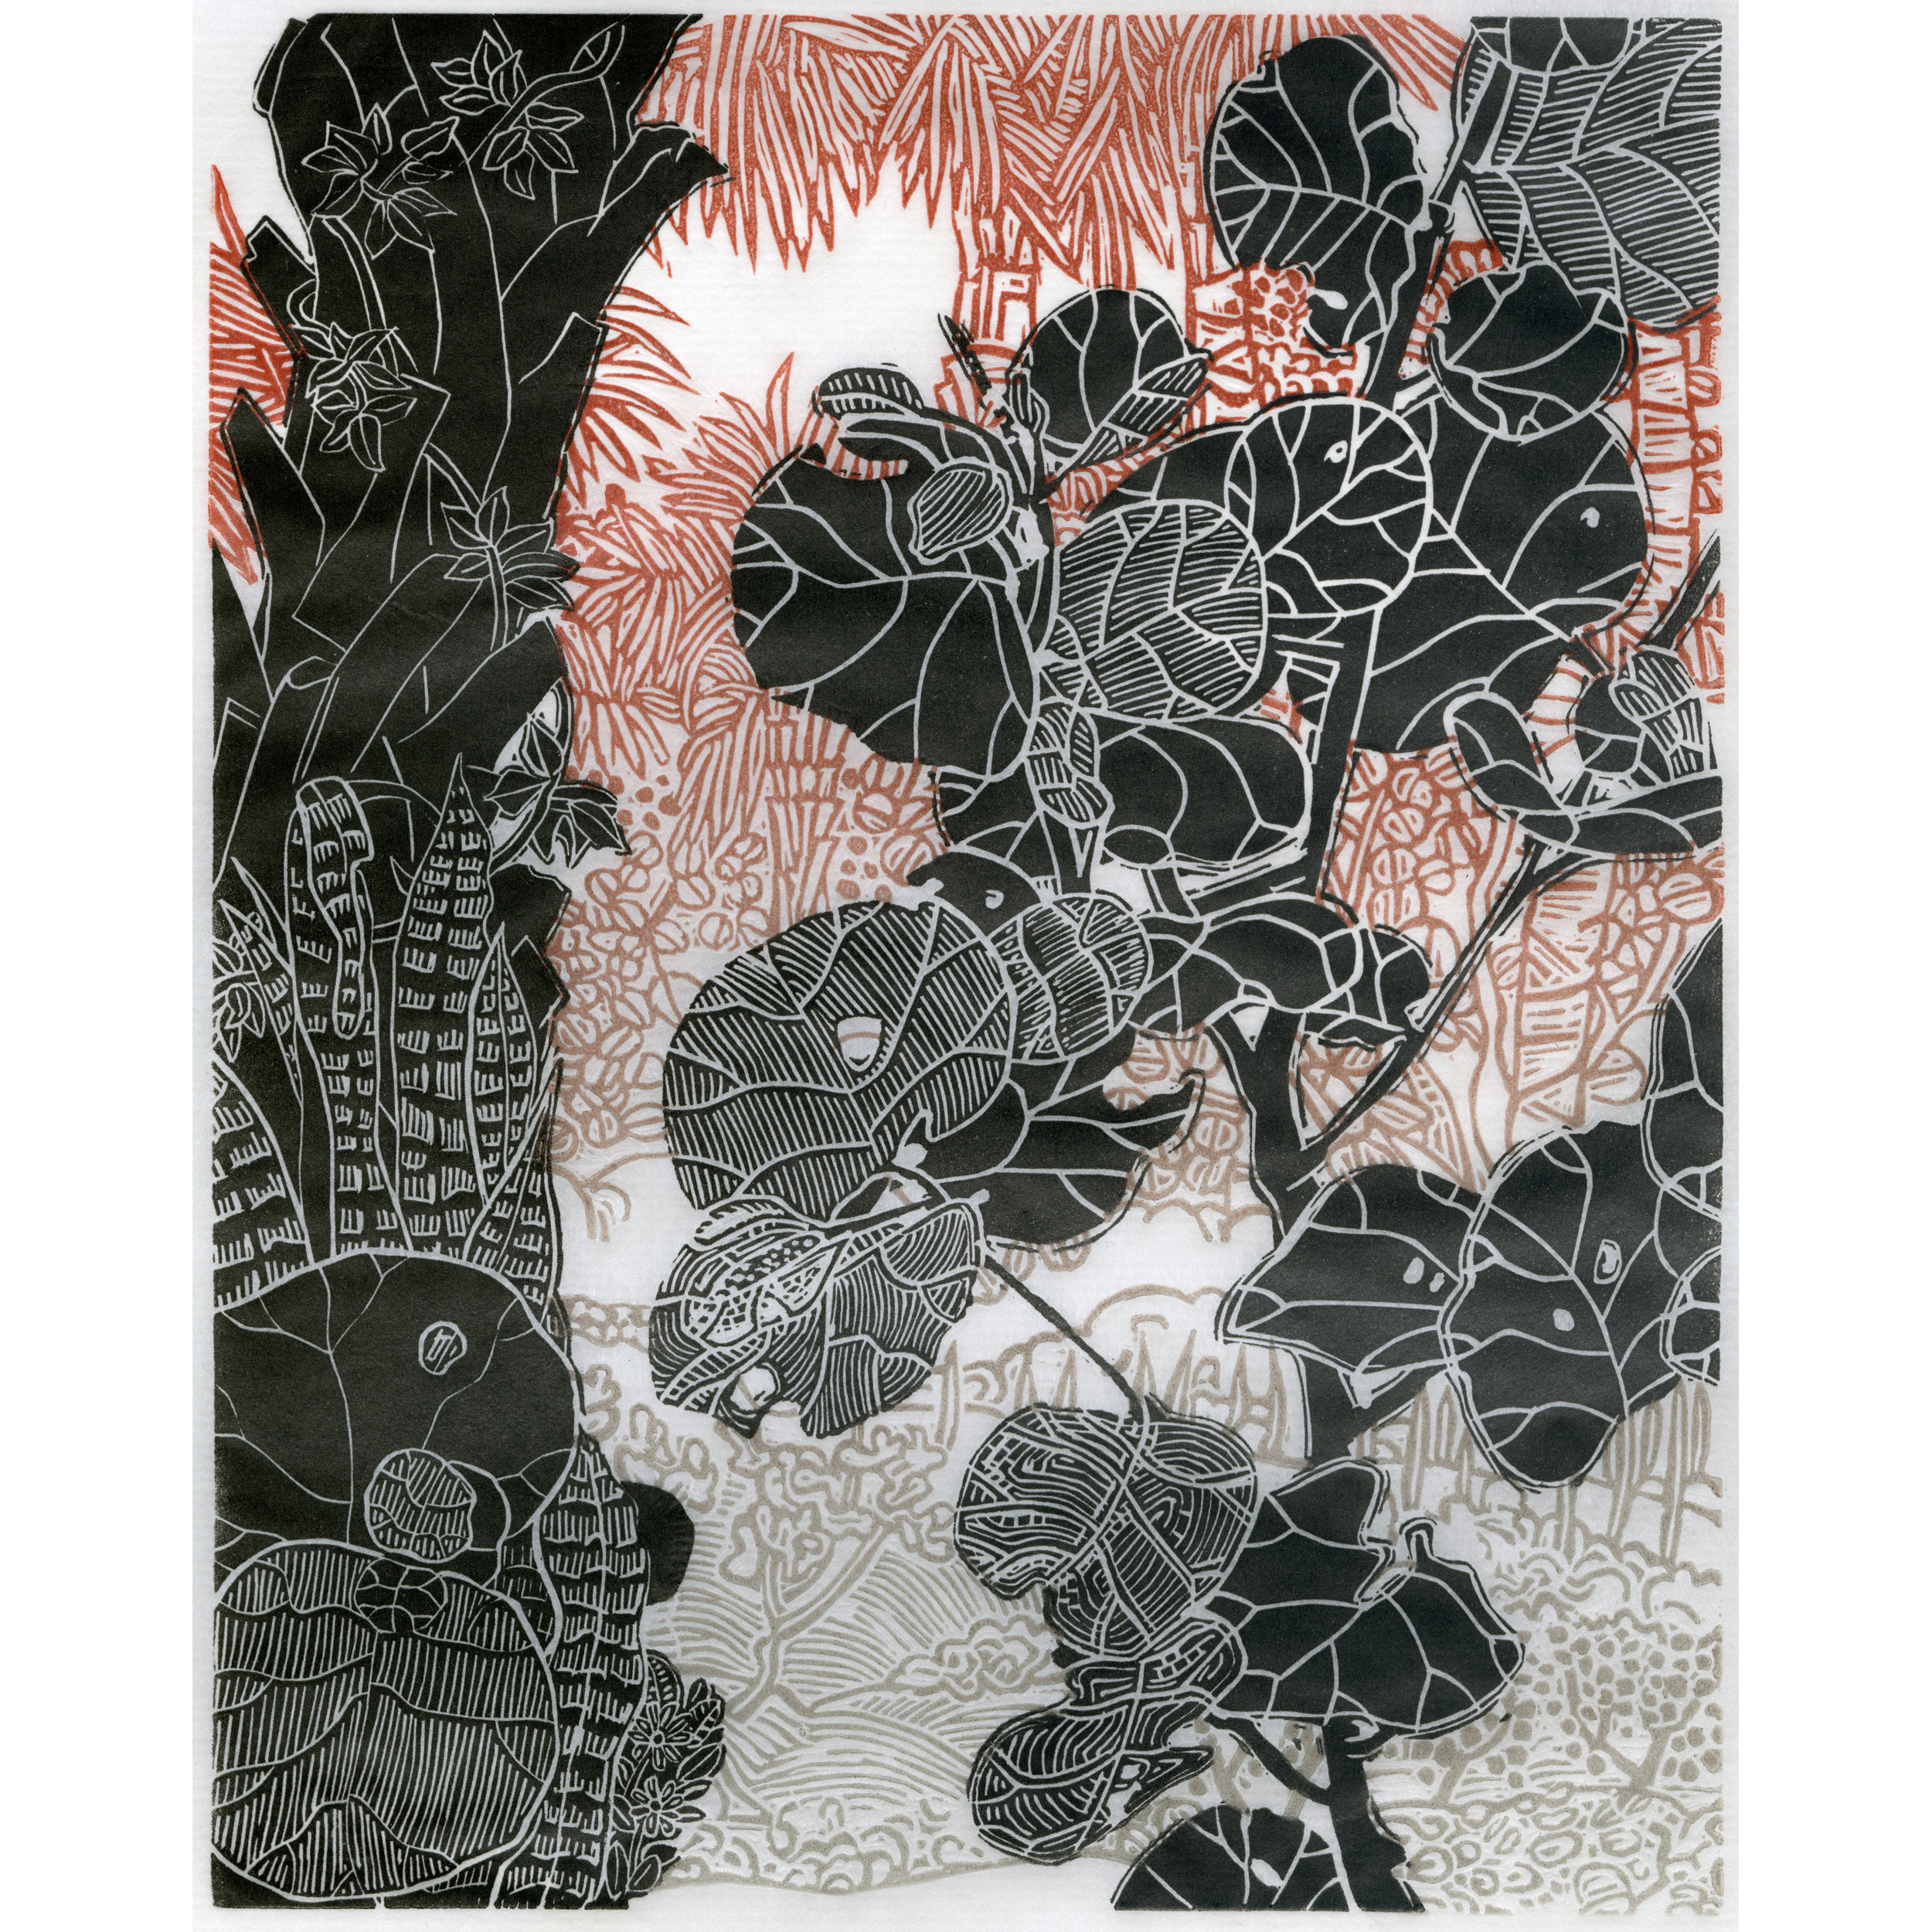 Sea Grape Branch 马尾藻枝,2014 2 block linocut with subtle blend rolls on each block printed on handmade Japanese Misu paper 日本手工纸上浮雕木版画 25.3 x 15.5 in. (64.3 x 39.4 cm) Edition 1 of 10